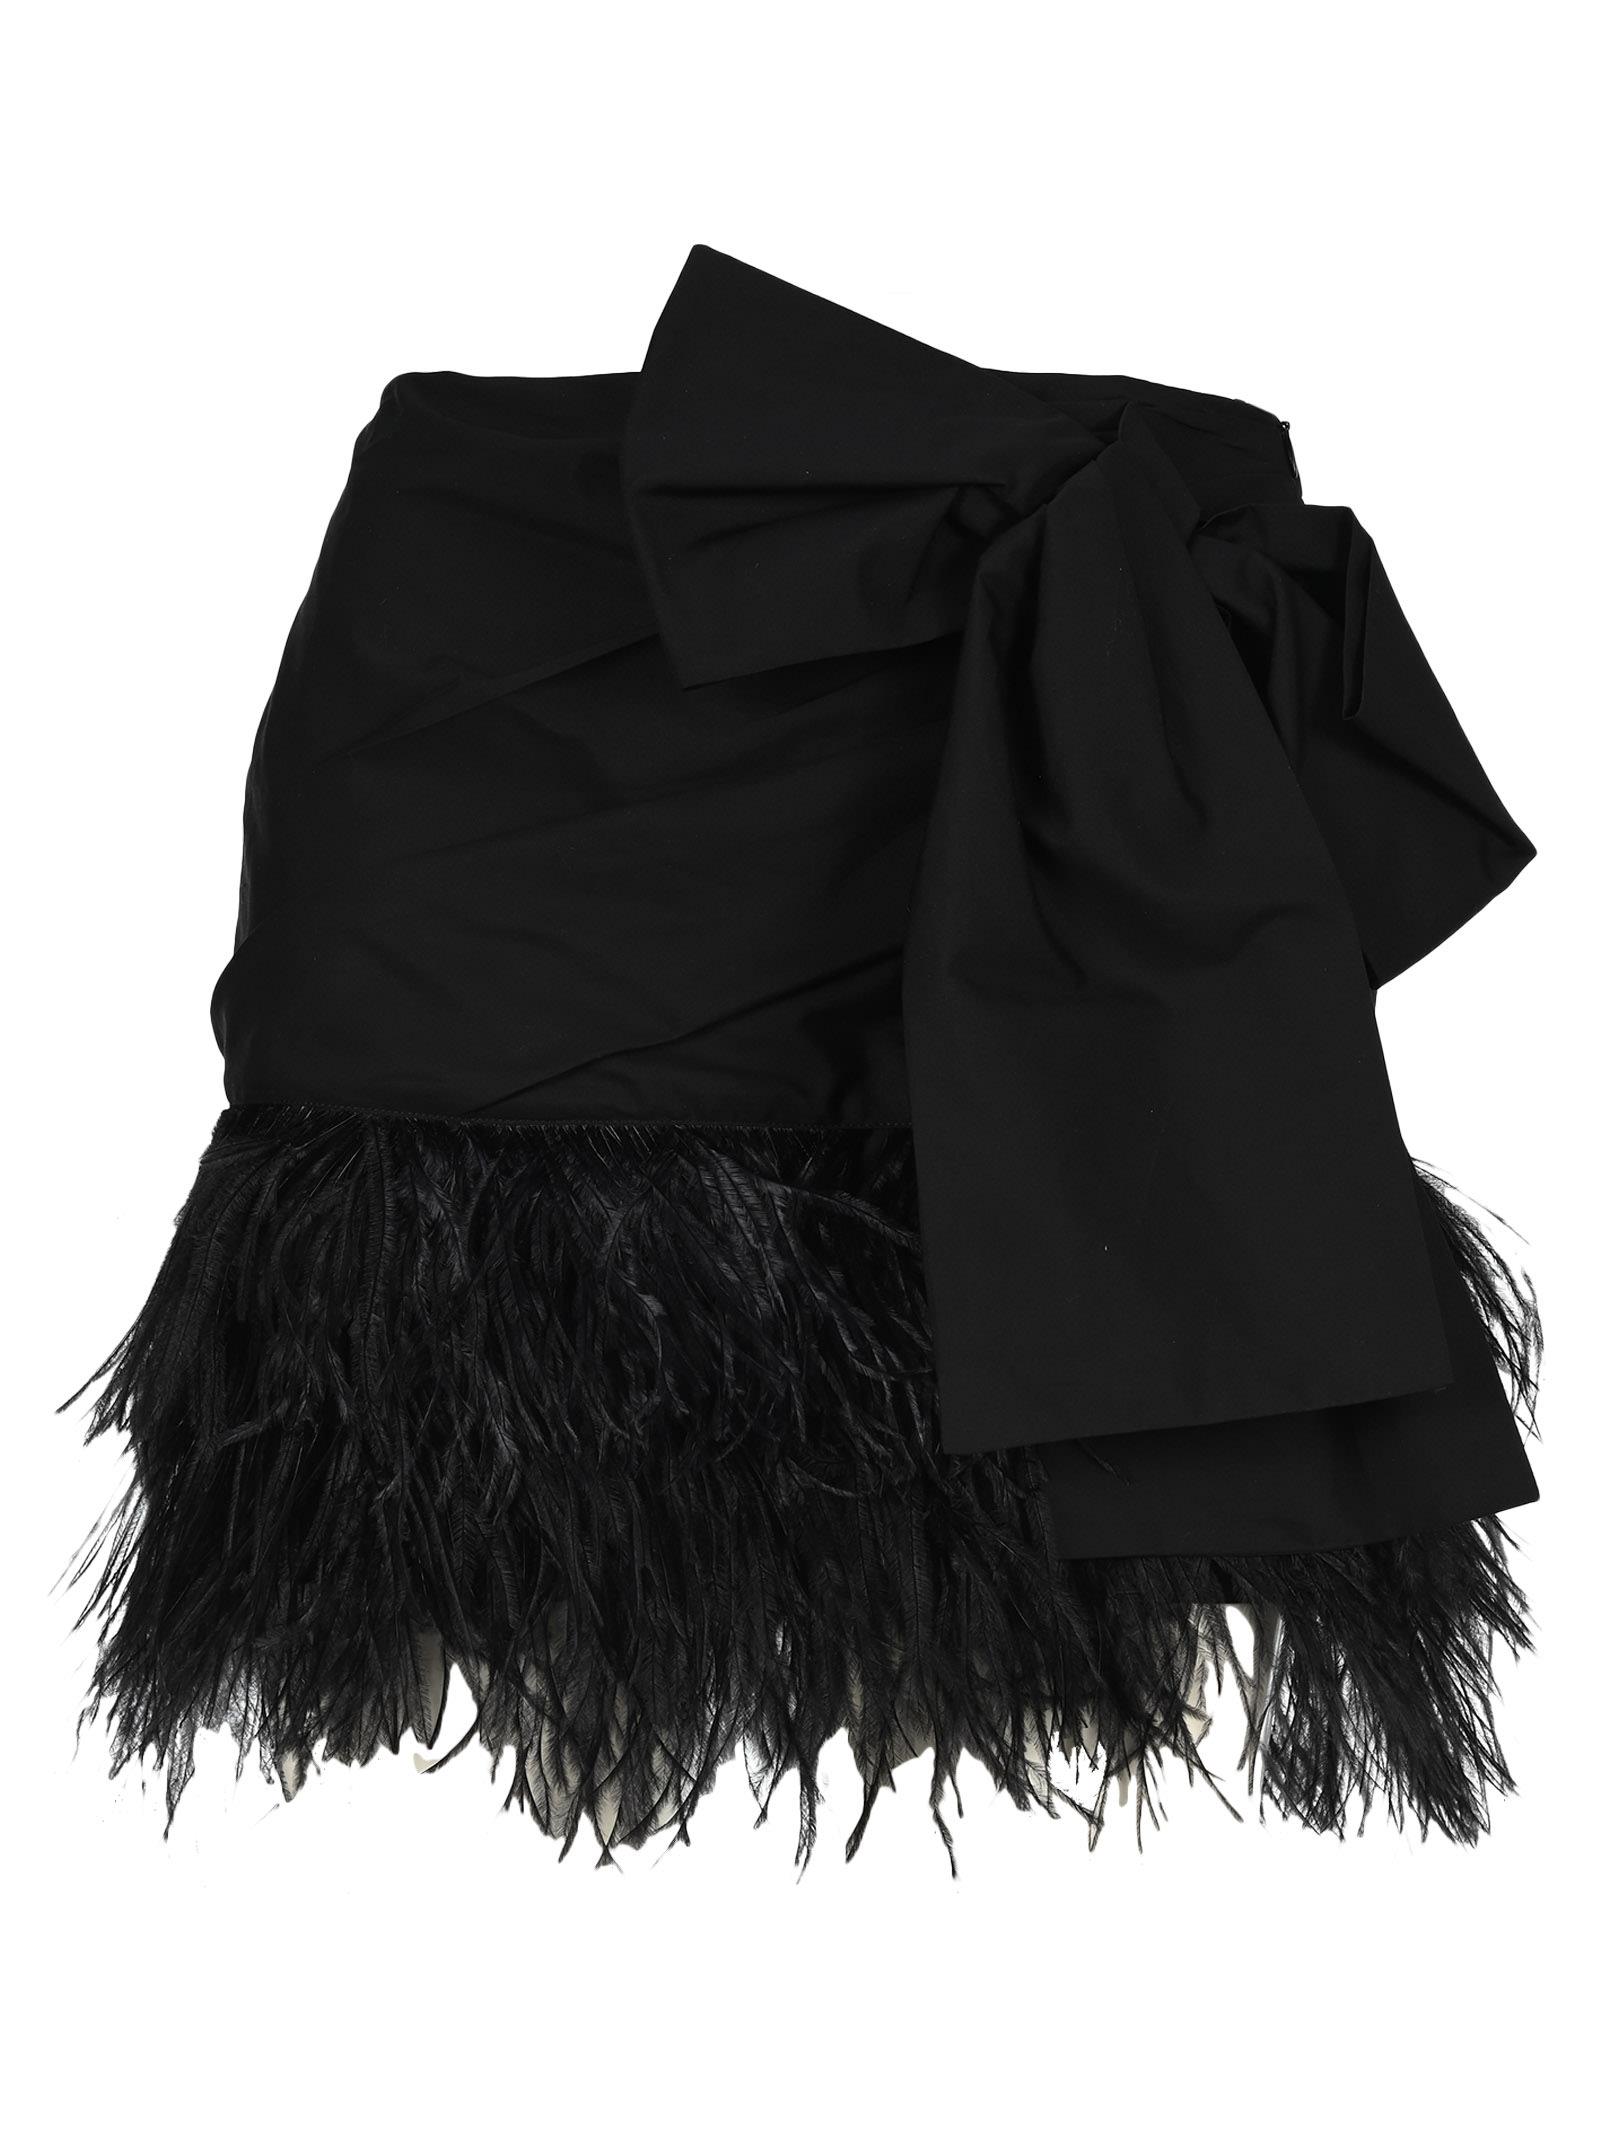 N21 Bow Mini Skirt